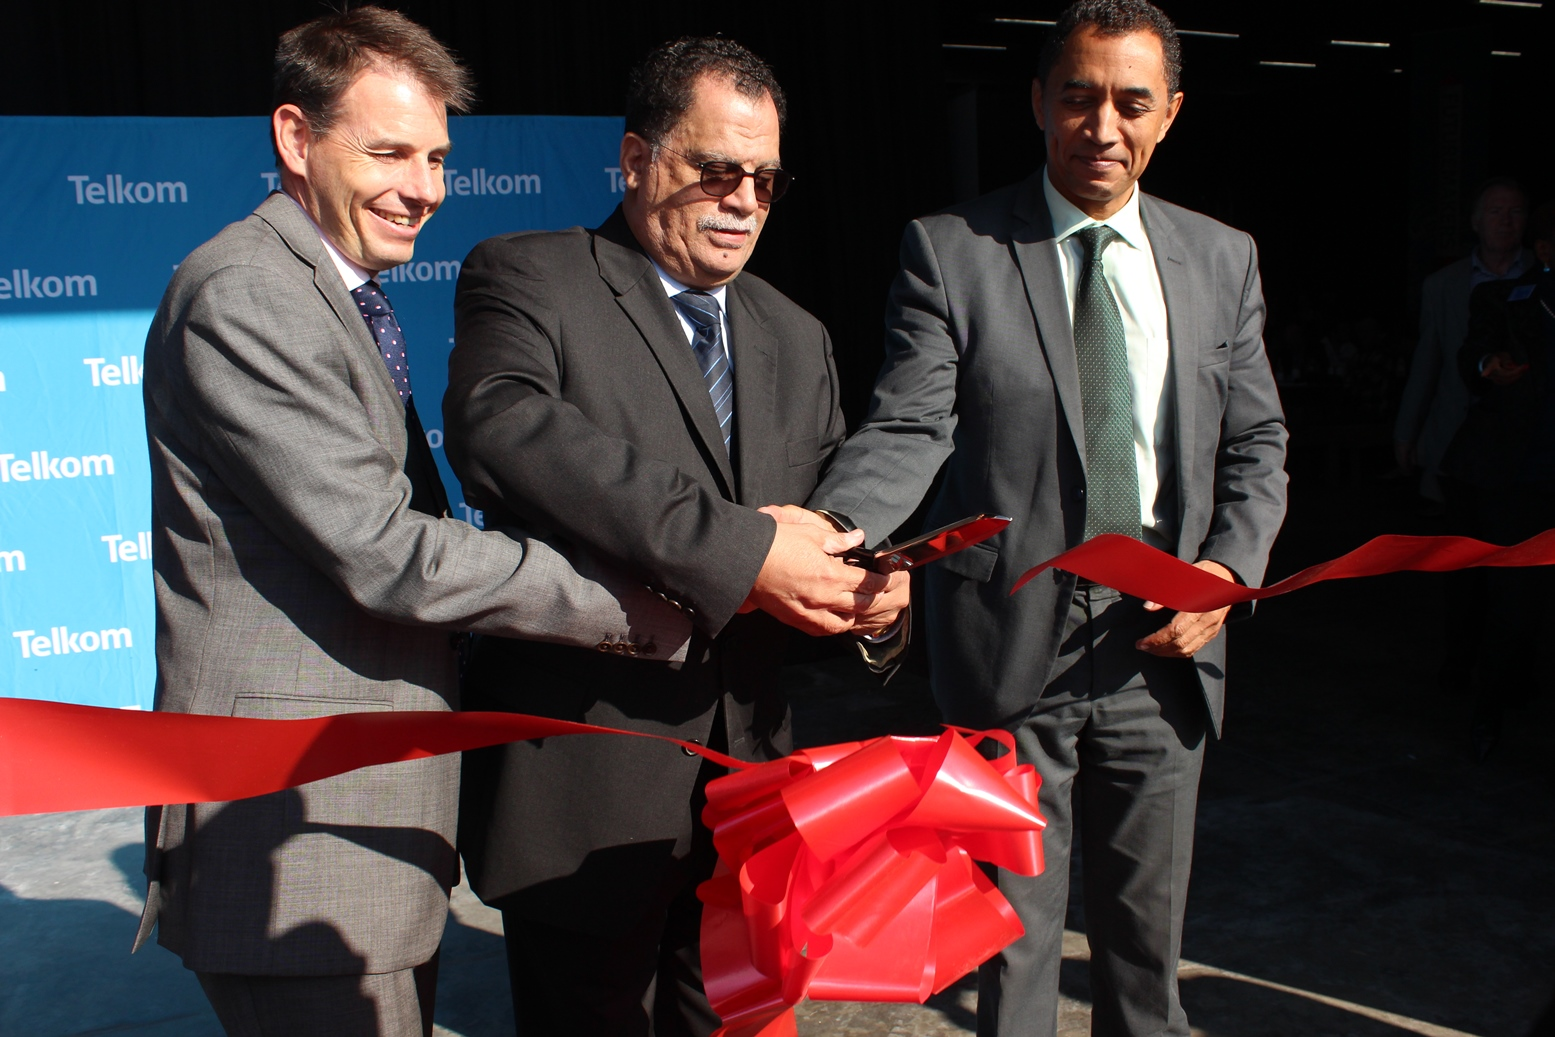 Telkom FutureMakers Hub launched at Propella Business Incubator